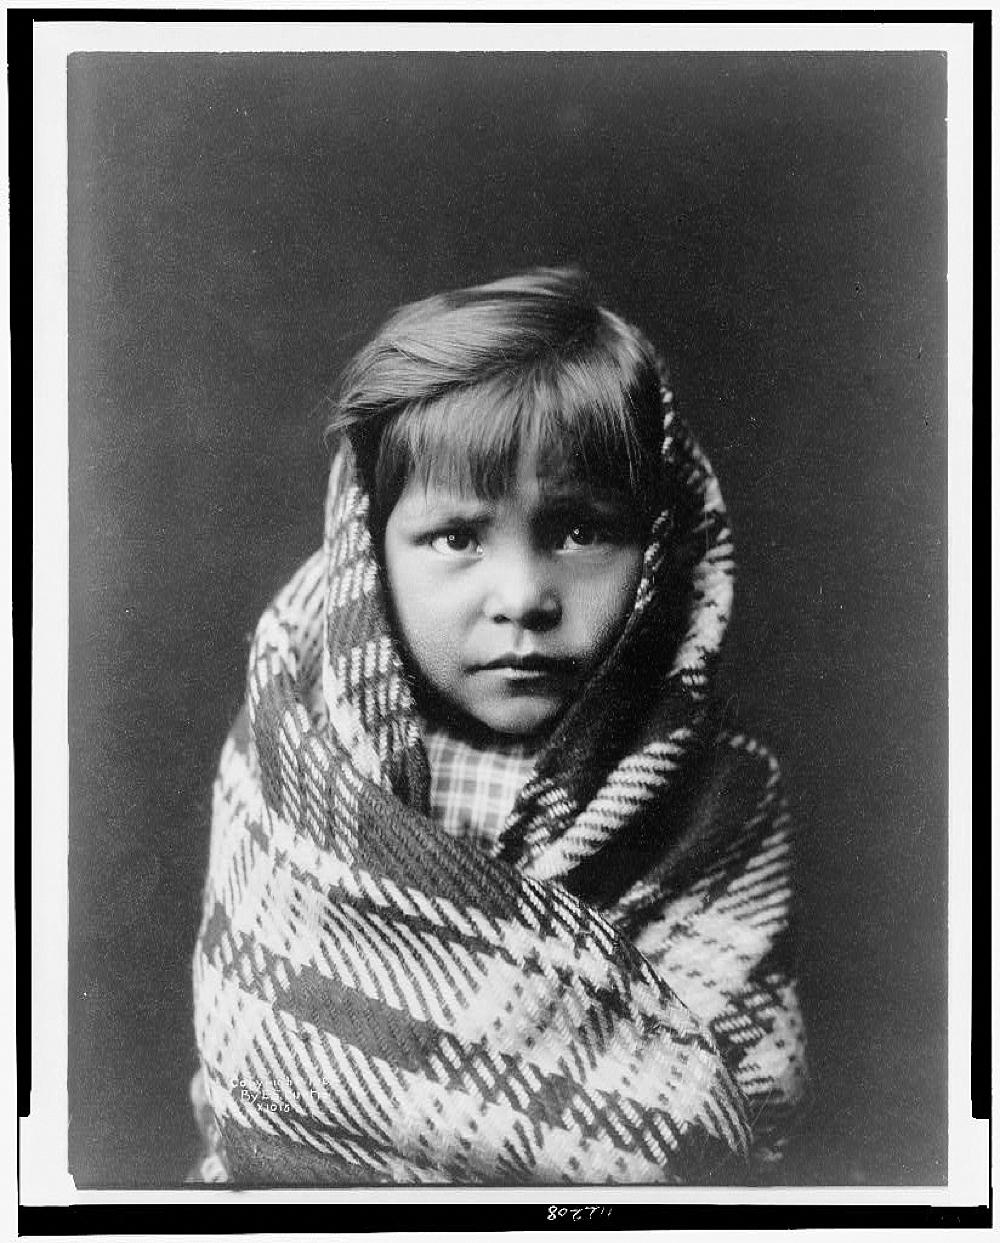 Navaho child